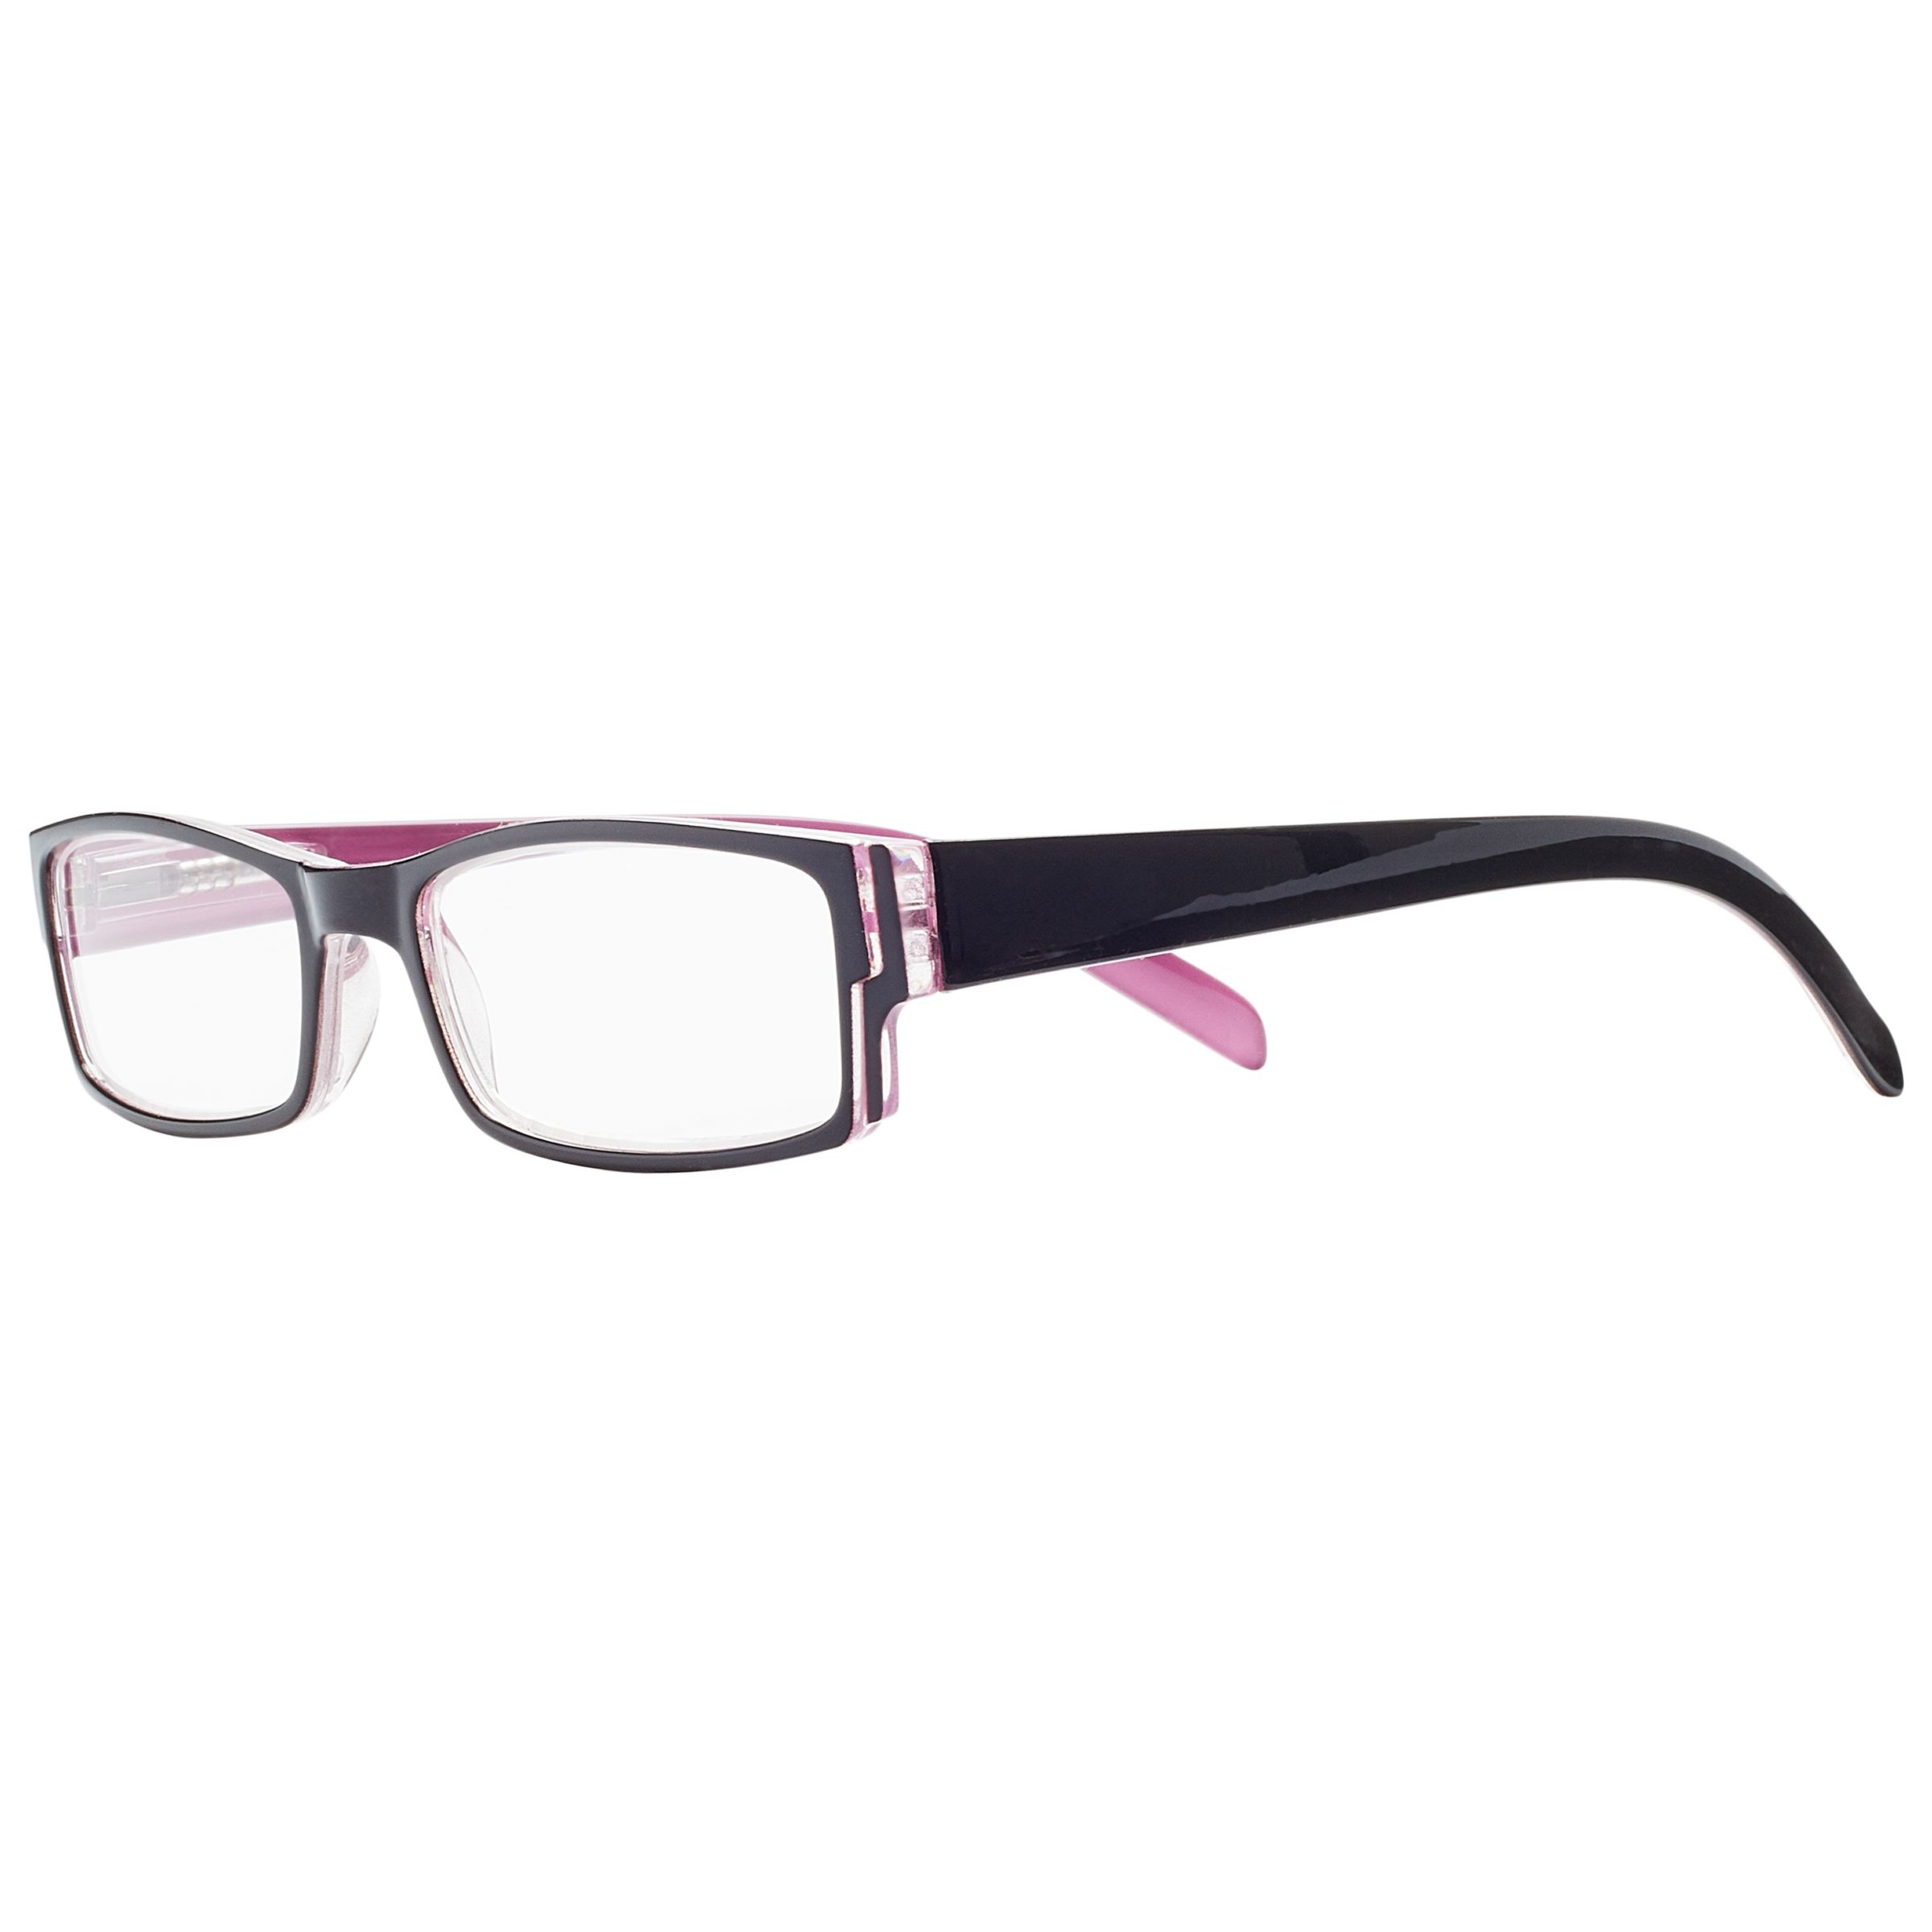 Magnif Eyes Magnif Eyes Ready Readers Carmel Glasses, Black/Rose